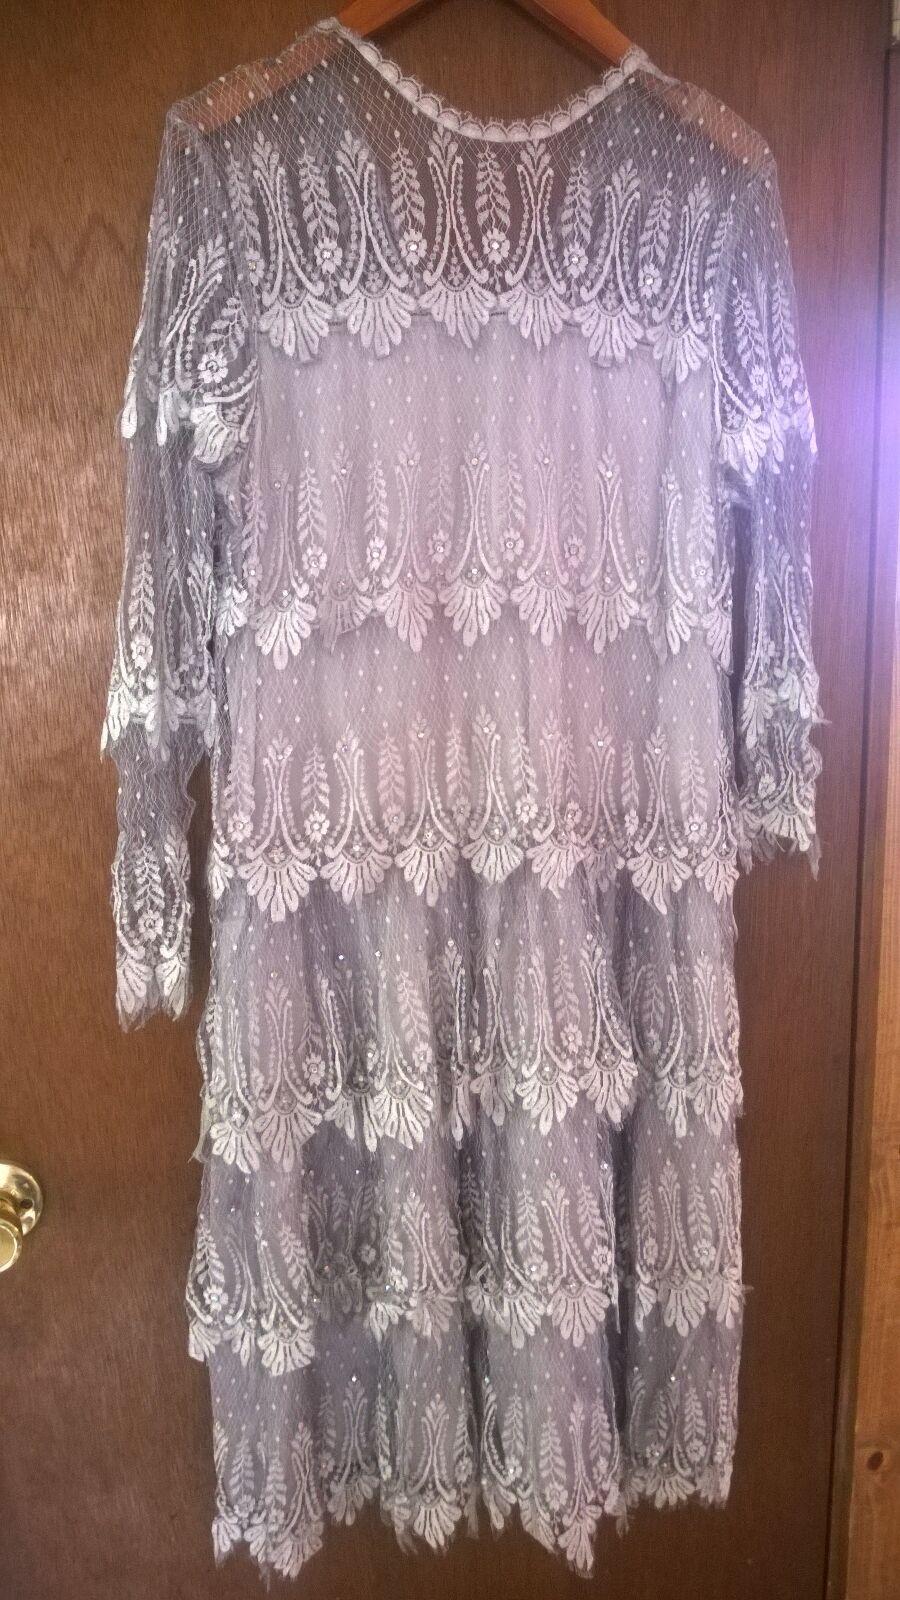 Vintage  RINA DI MONTELLA Nieman-Marcus Drop skirt Silk Lace Dress Sz 12